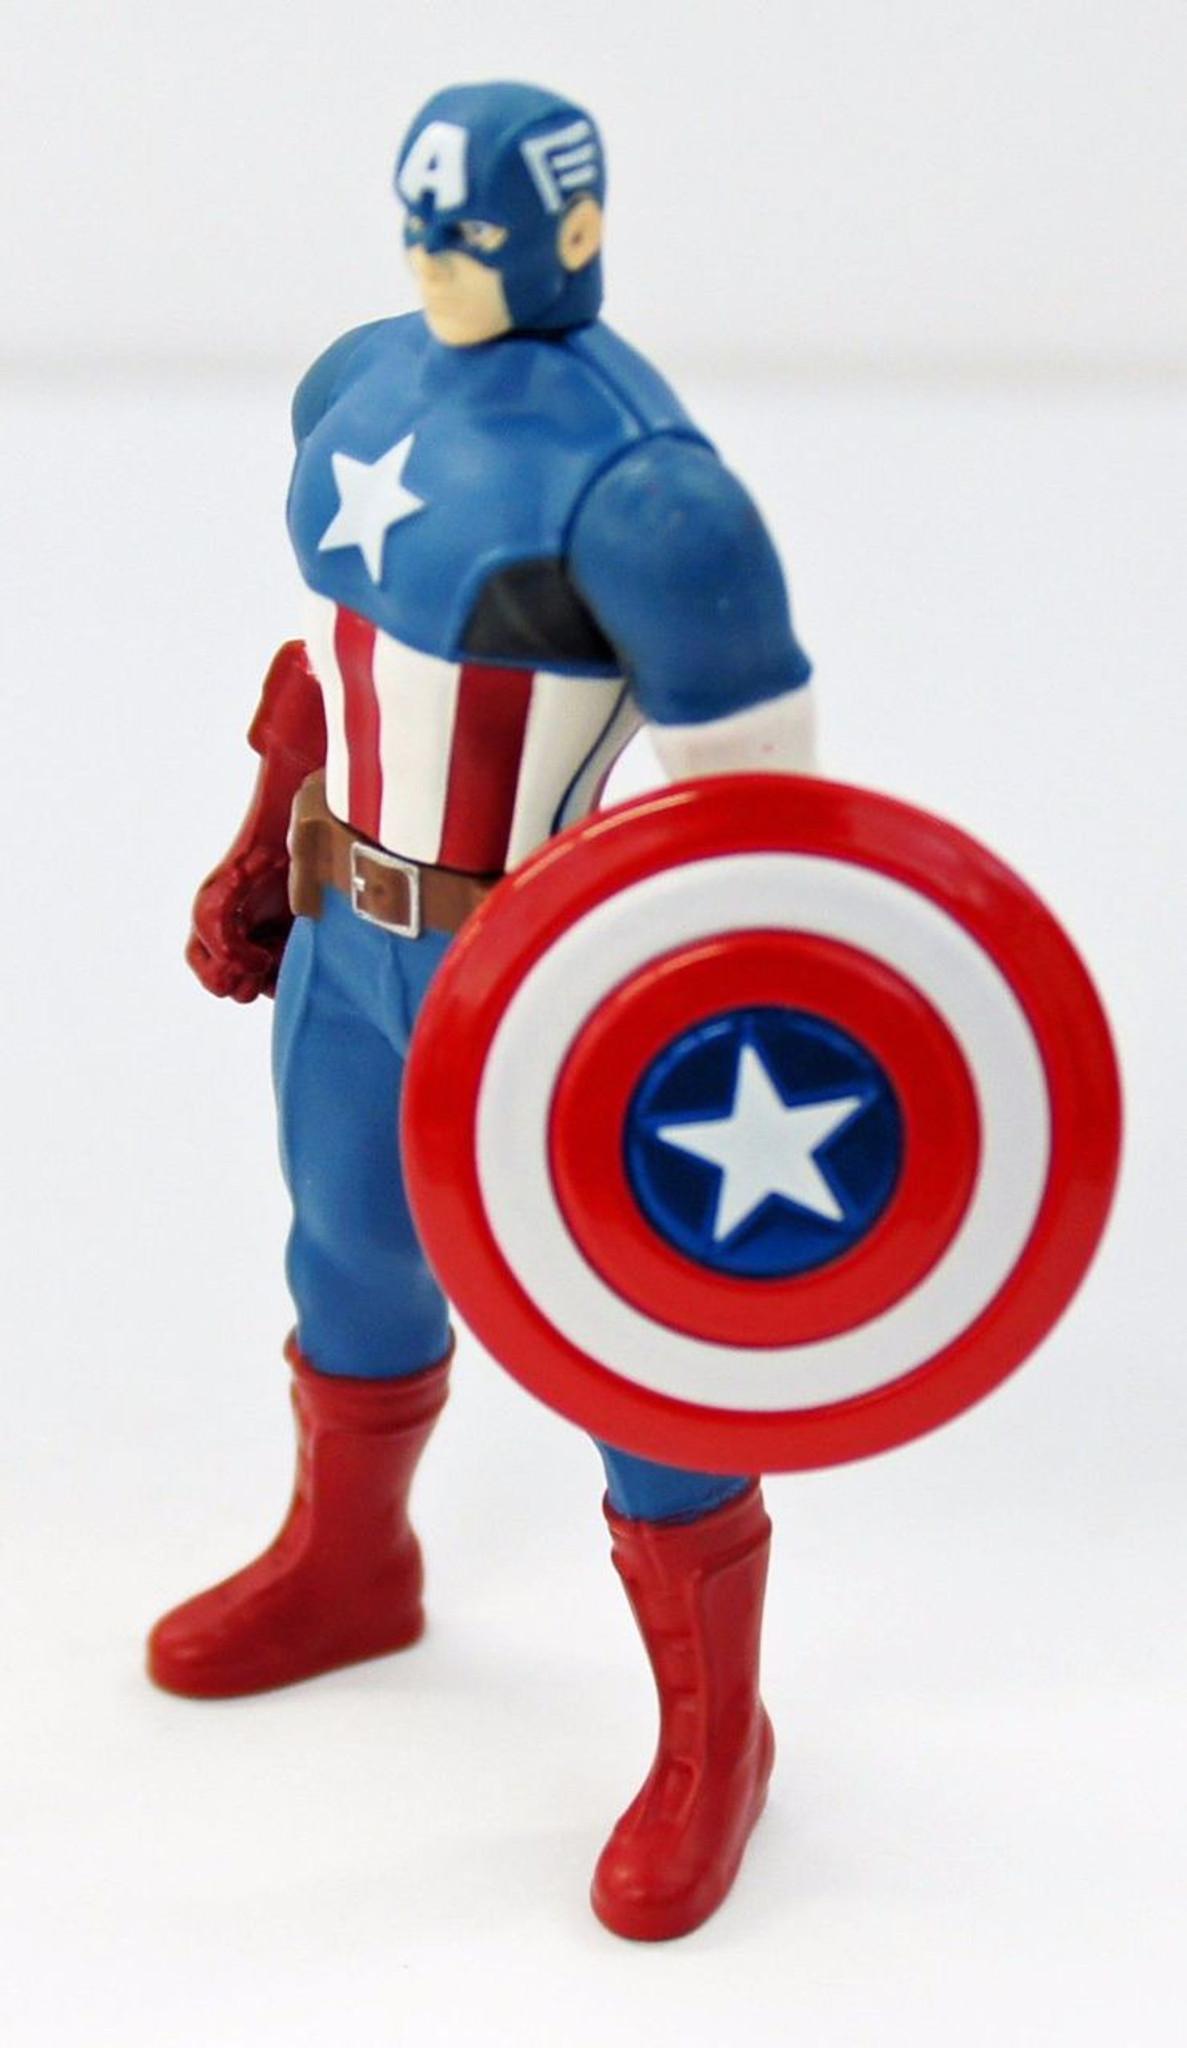 Chogokin Mini Metal Figure Diecast CAPTAIN AMERICA AVENGERS Marvel Takara Tomy